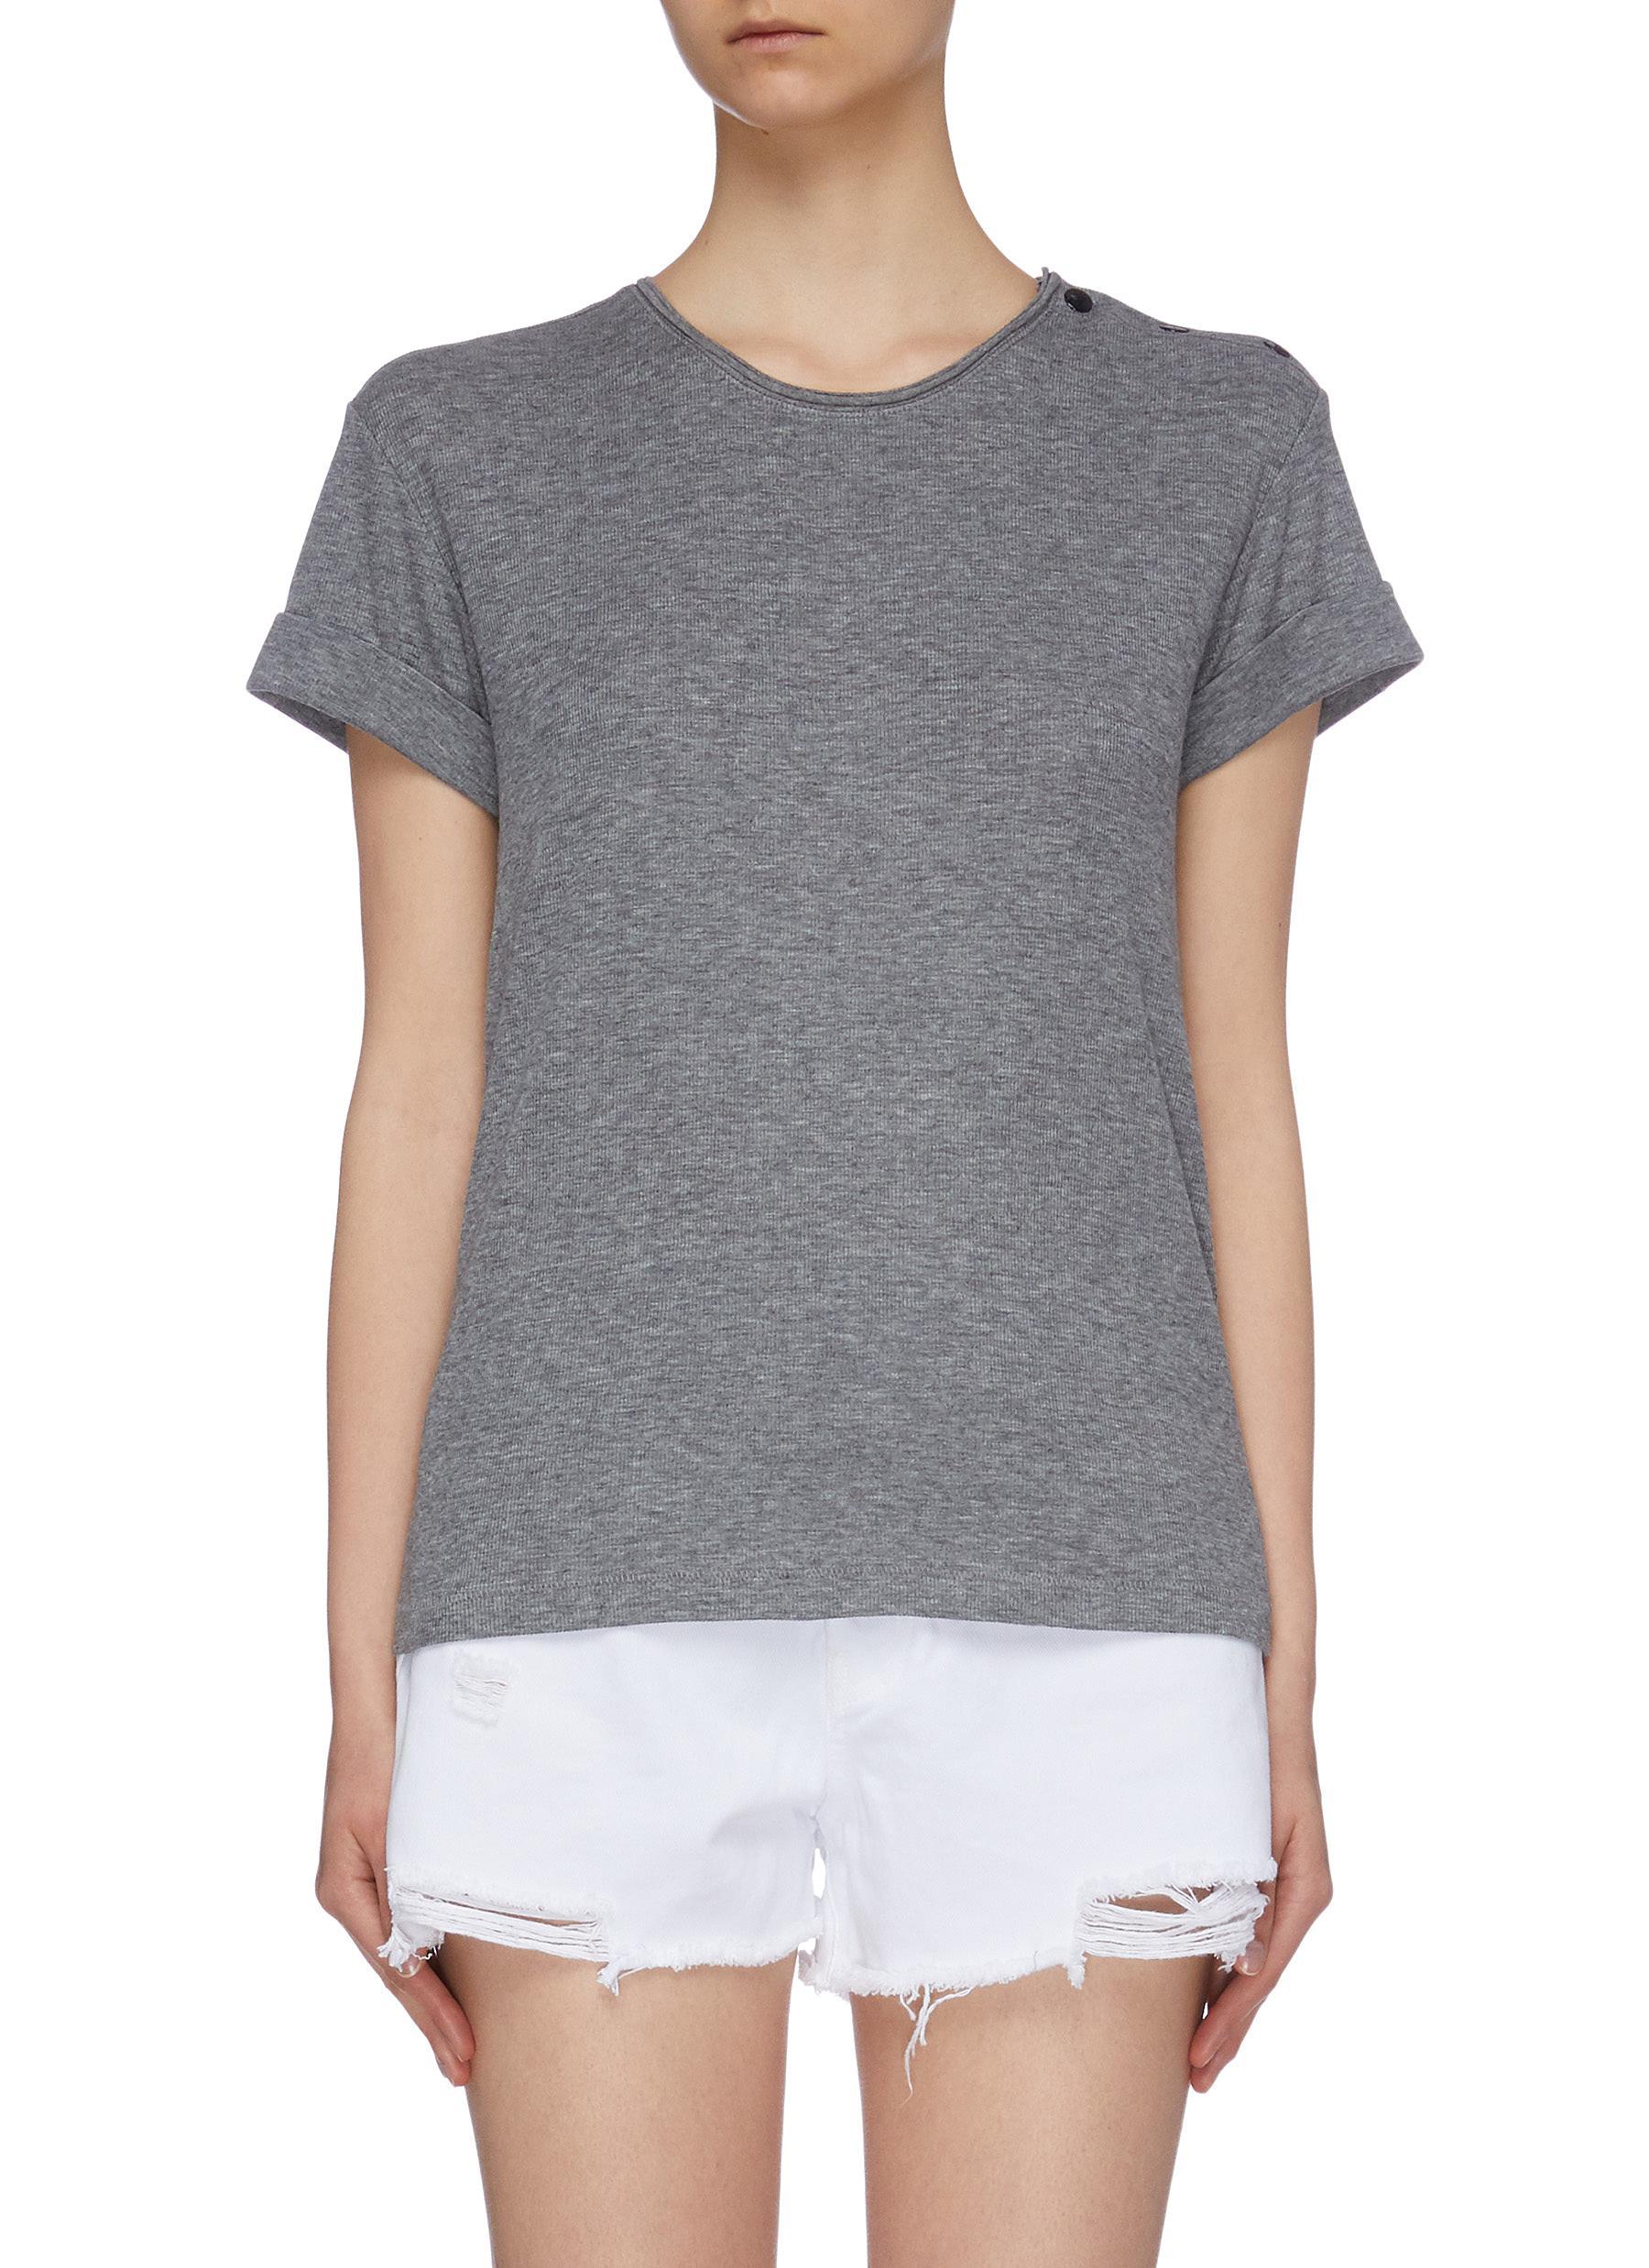 Mac button shoulder T-shirt by Rag & Bone/Jean